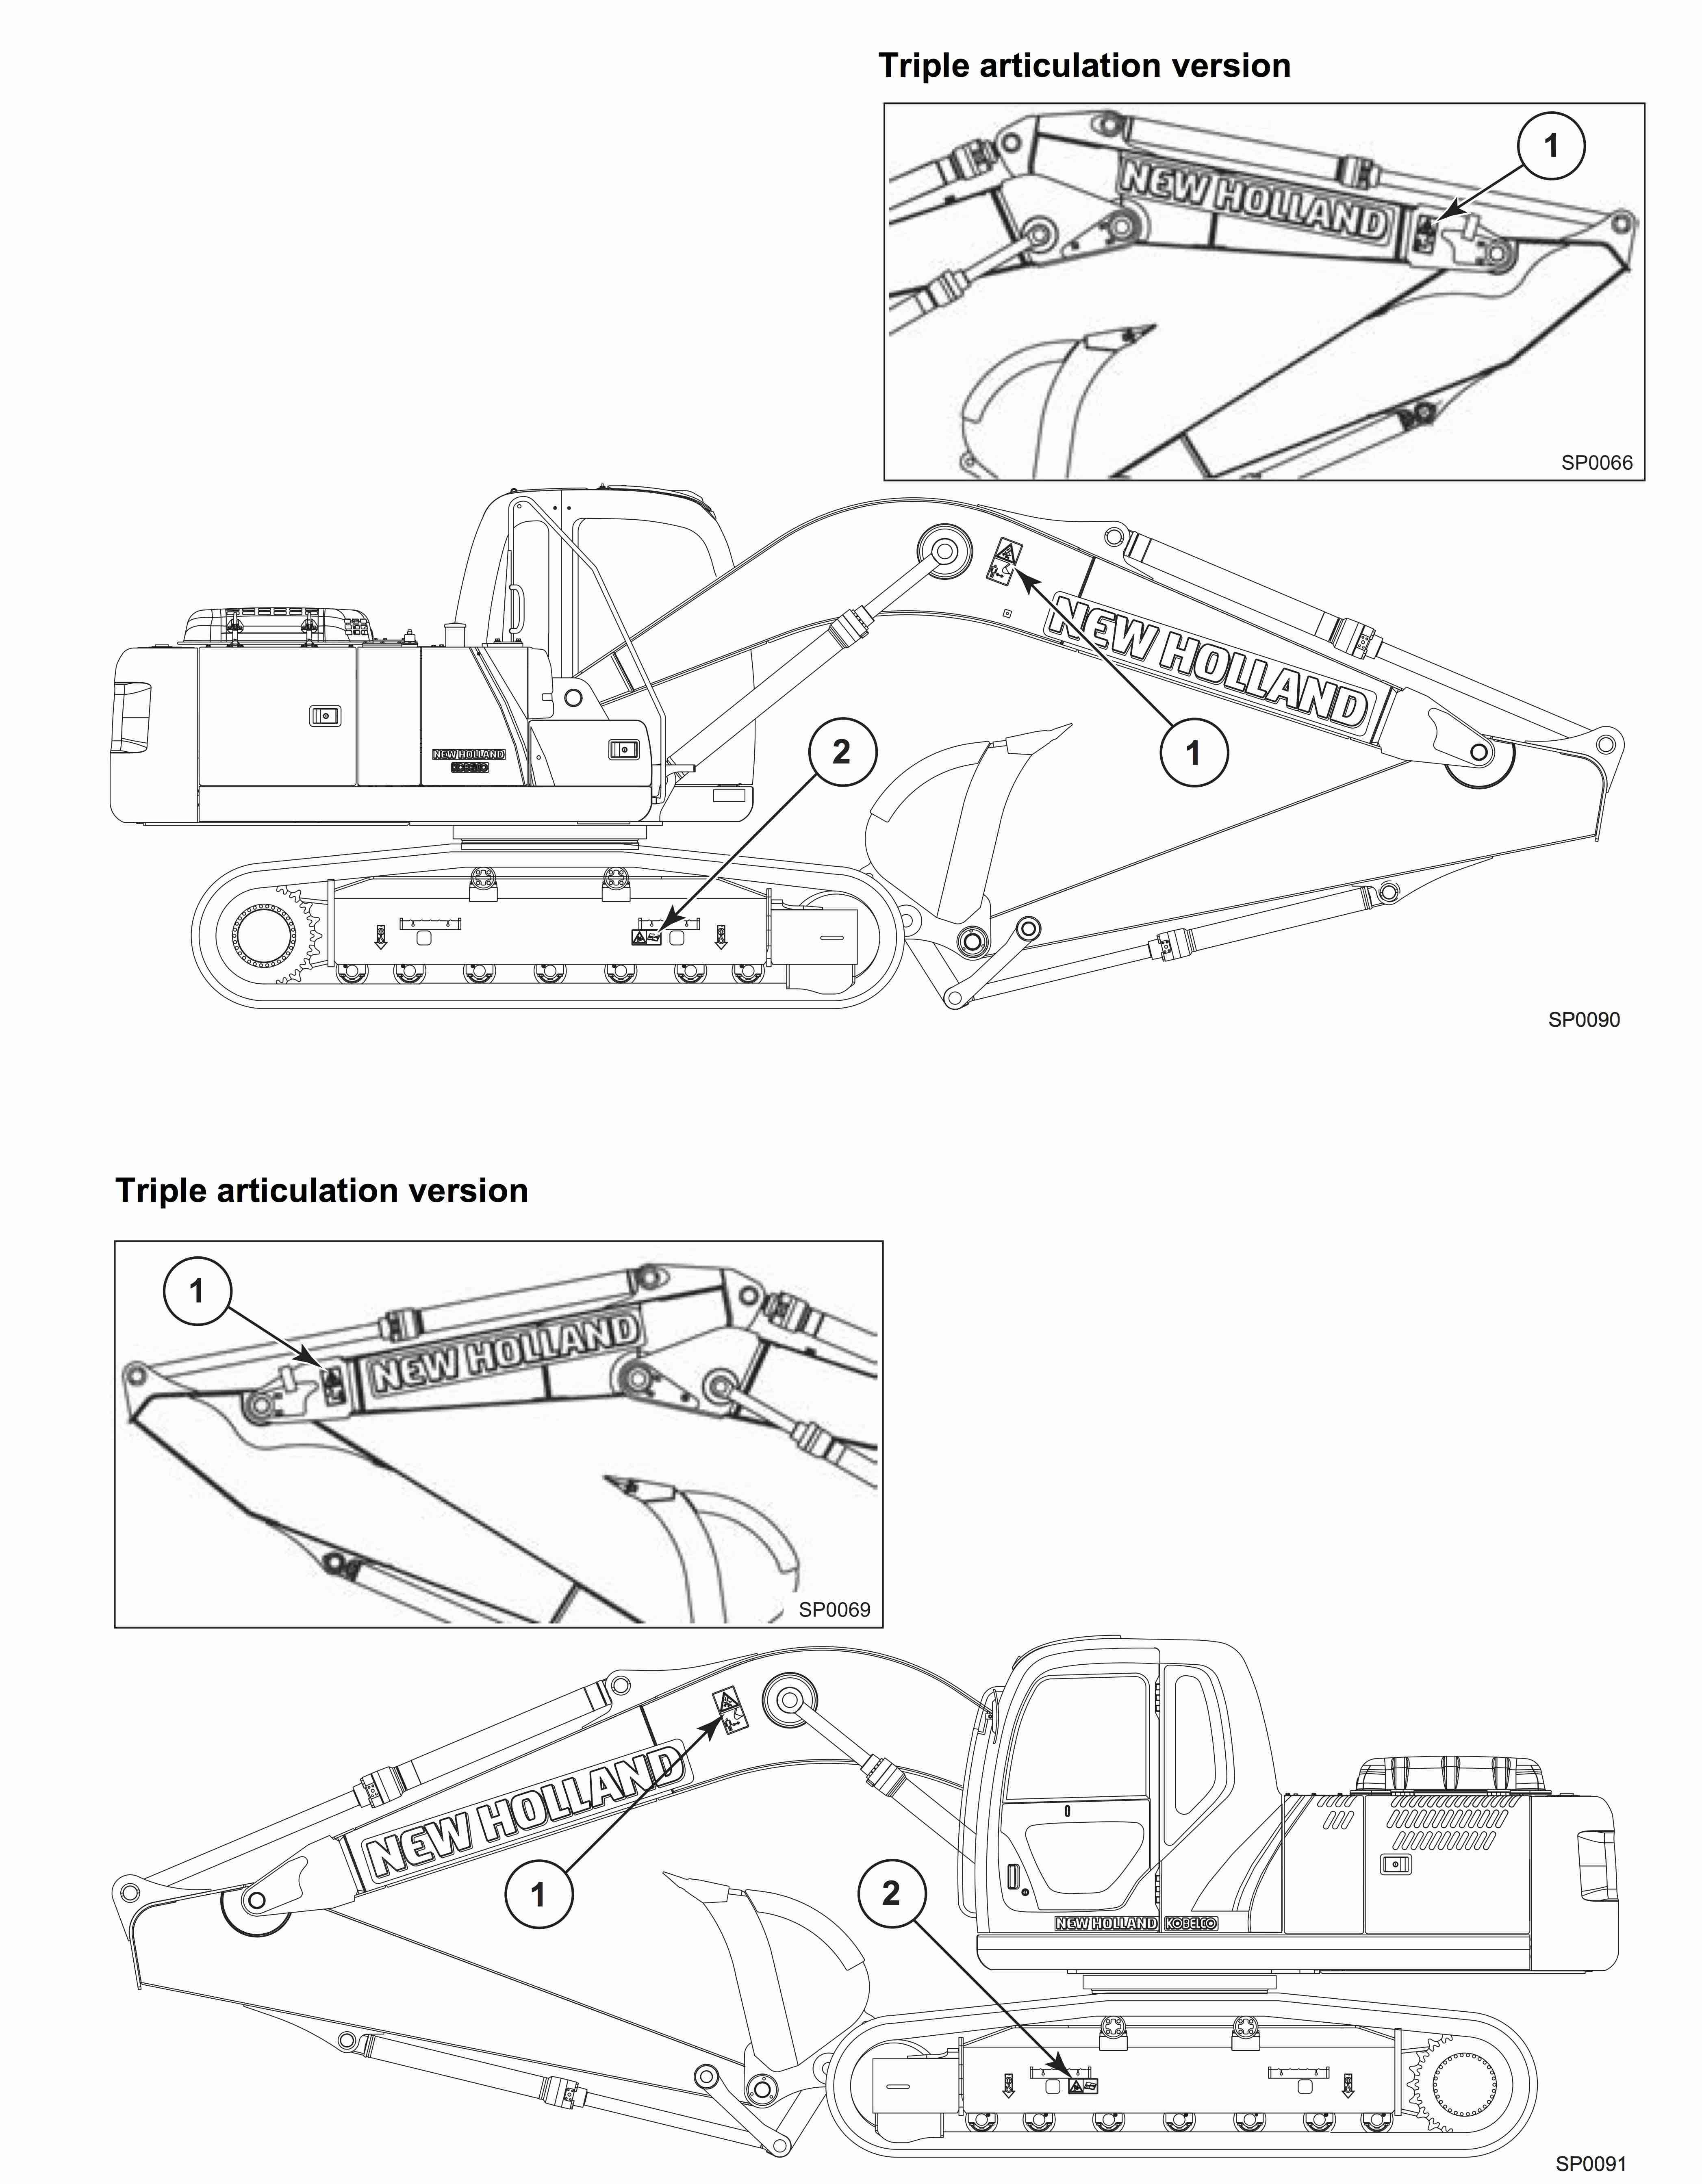 [DIAGRAM] Kubota Kh 36 Excavator Workshop Service Manual